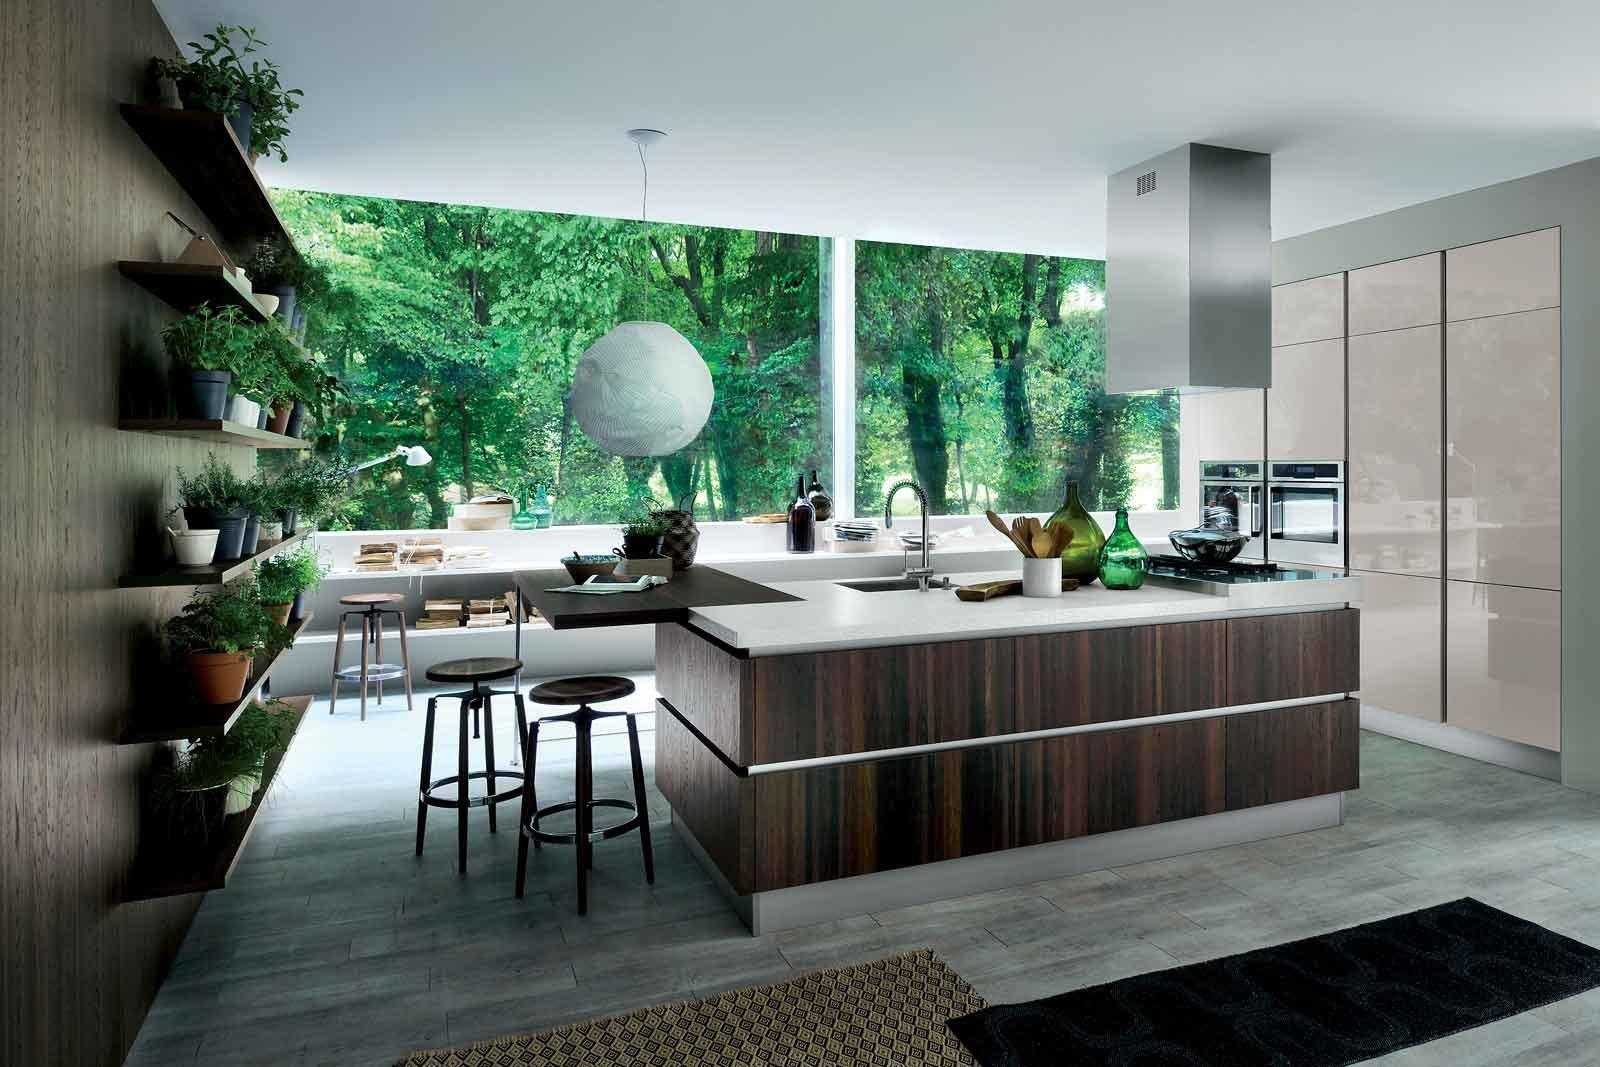 Cucine con elementi a boiserie cose di casa for Piani di casa in stile rambler